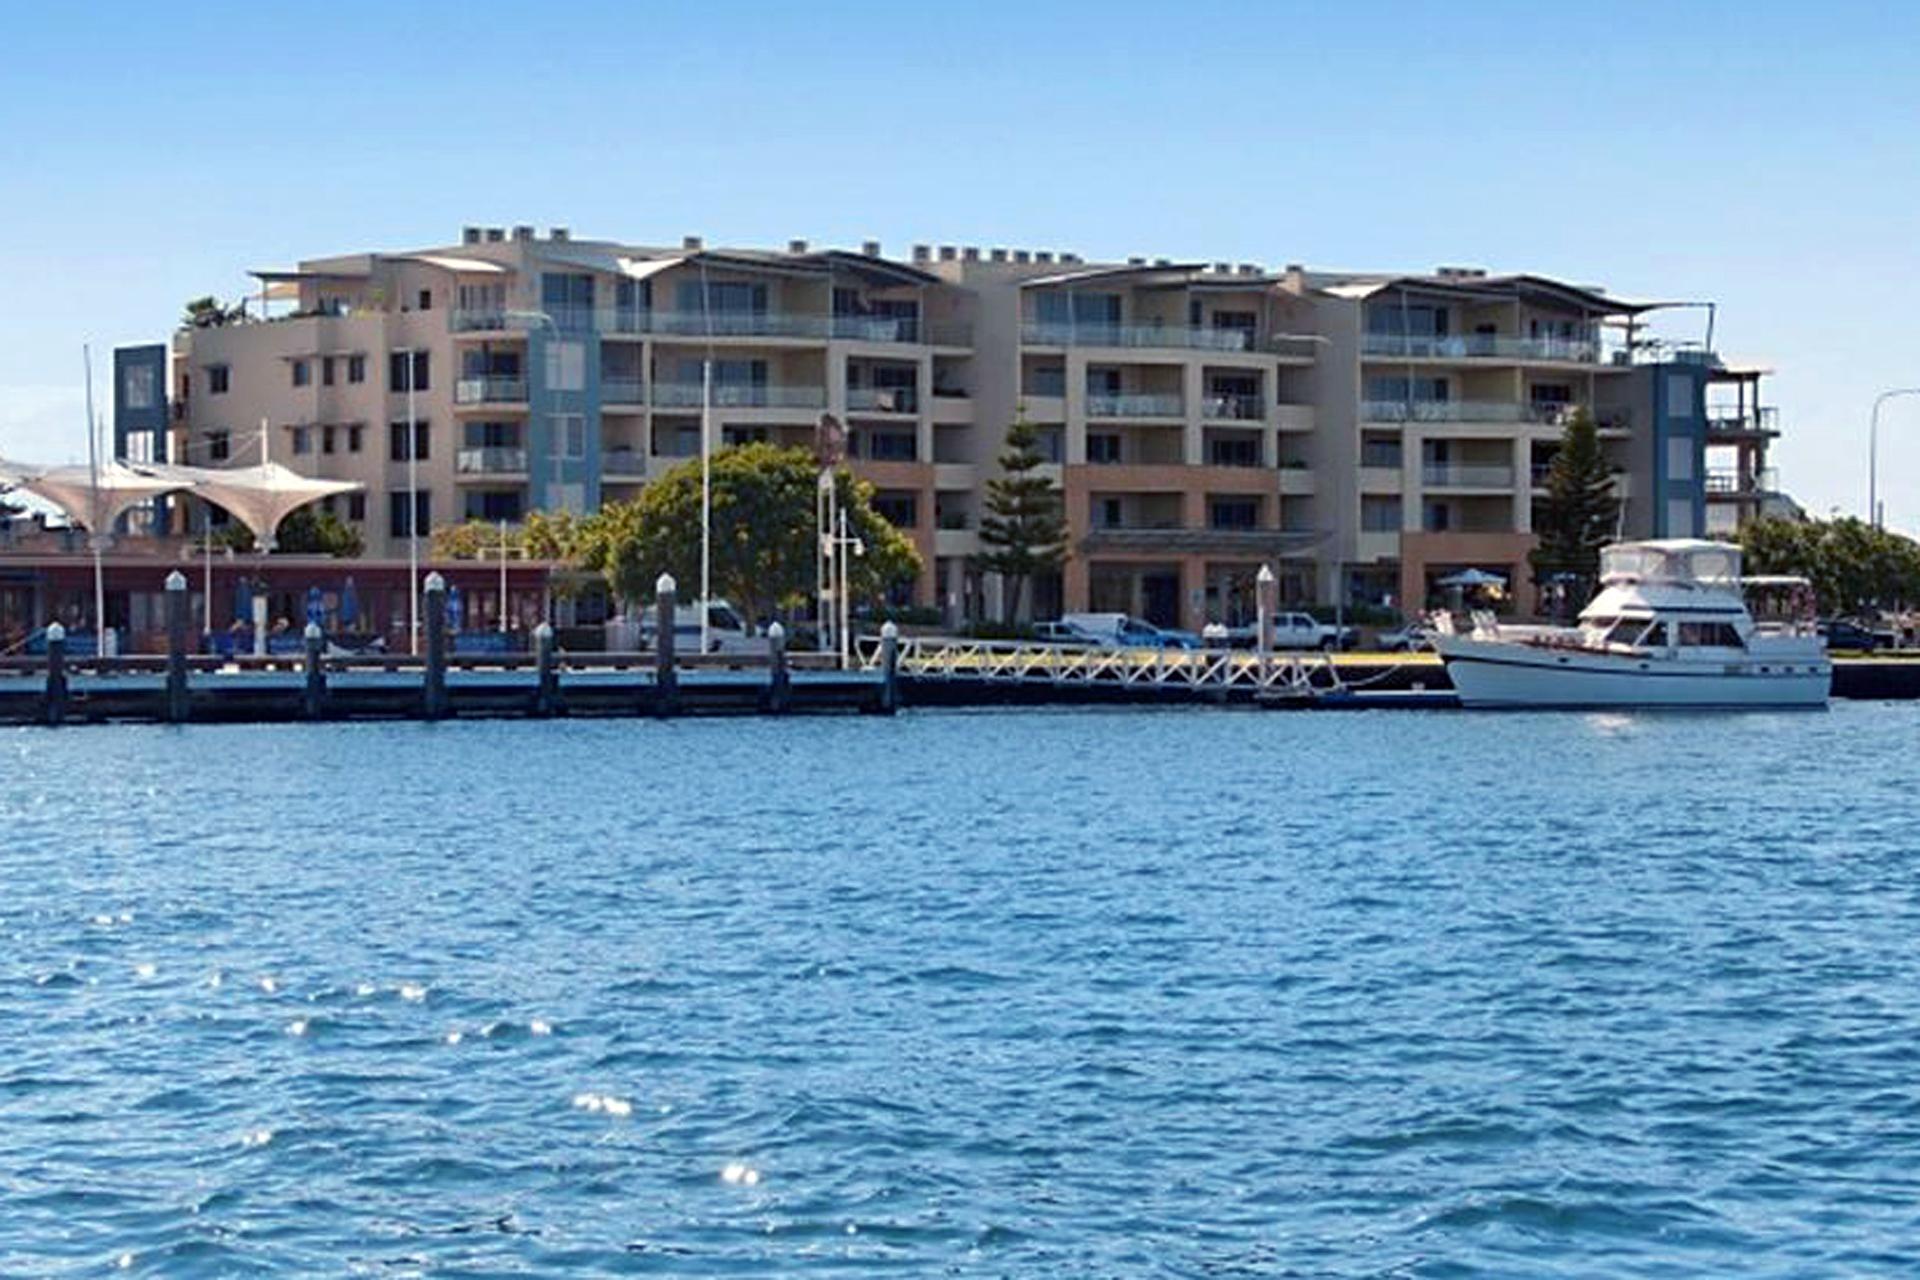 h - Riverside Holiday Apartments